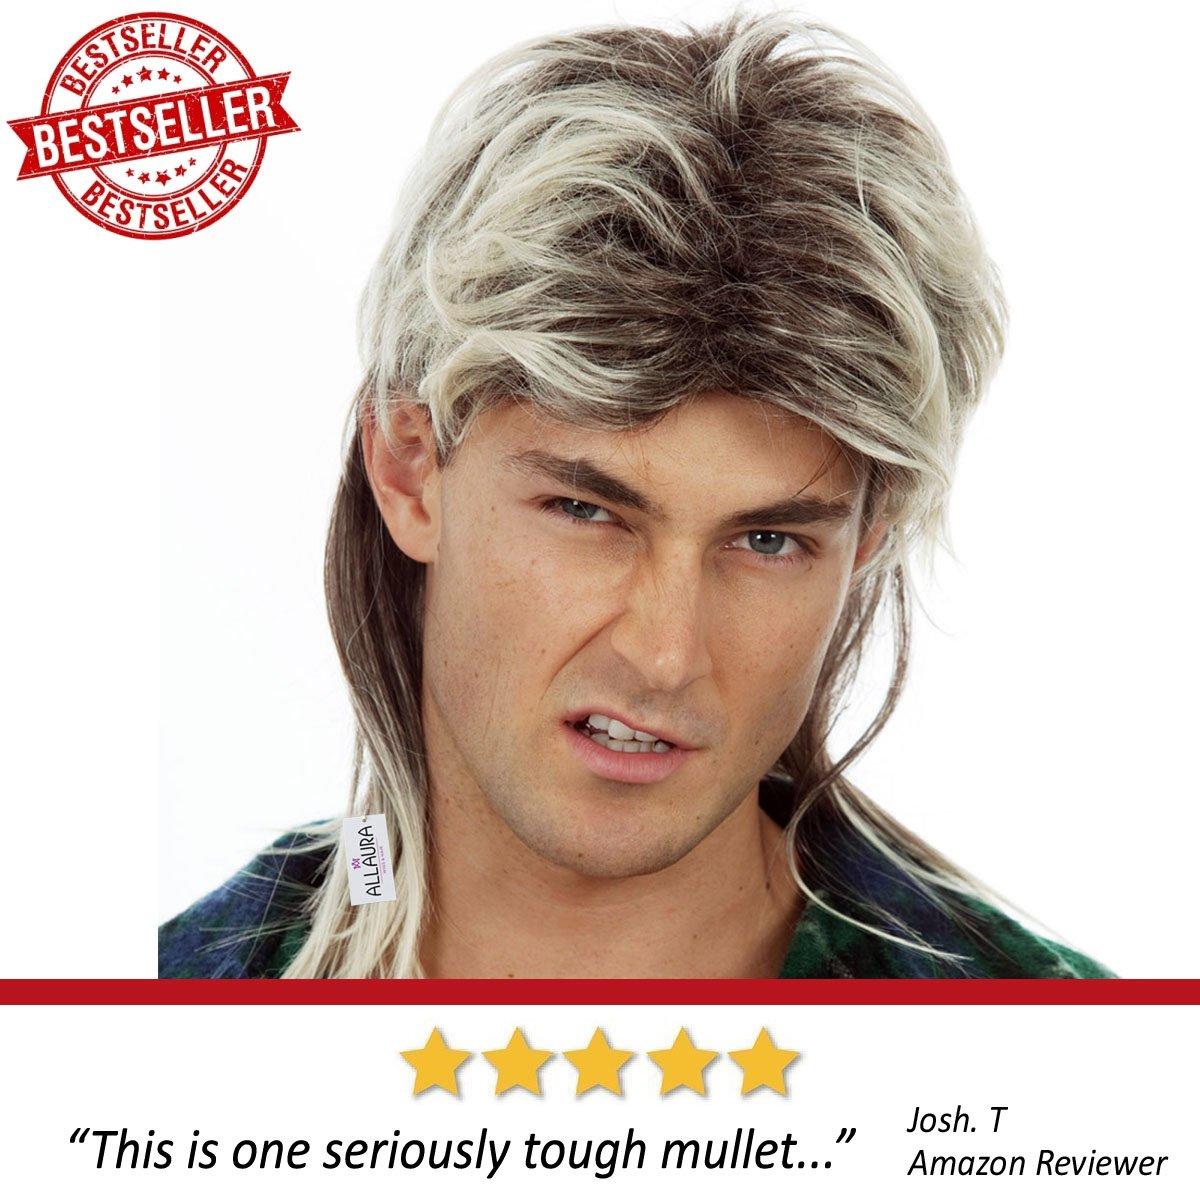 80s Blonde Mullet Wig for Men - Joe Dirt Wigs White Trash Redneck Costume by ALLAURA (Image #2)